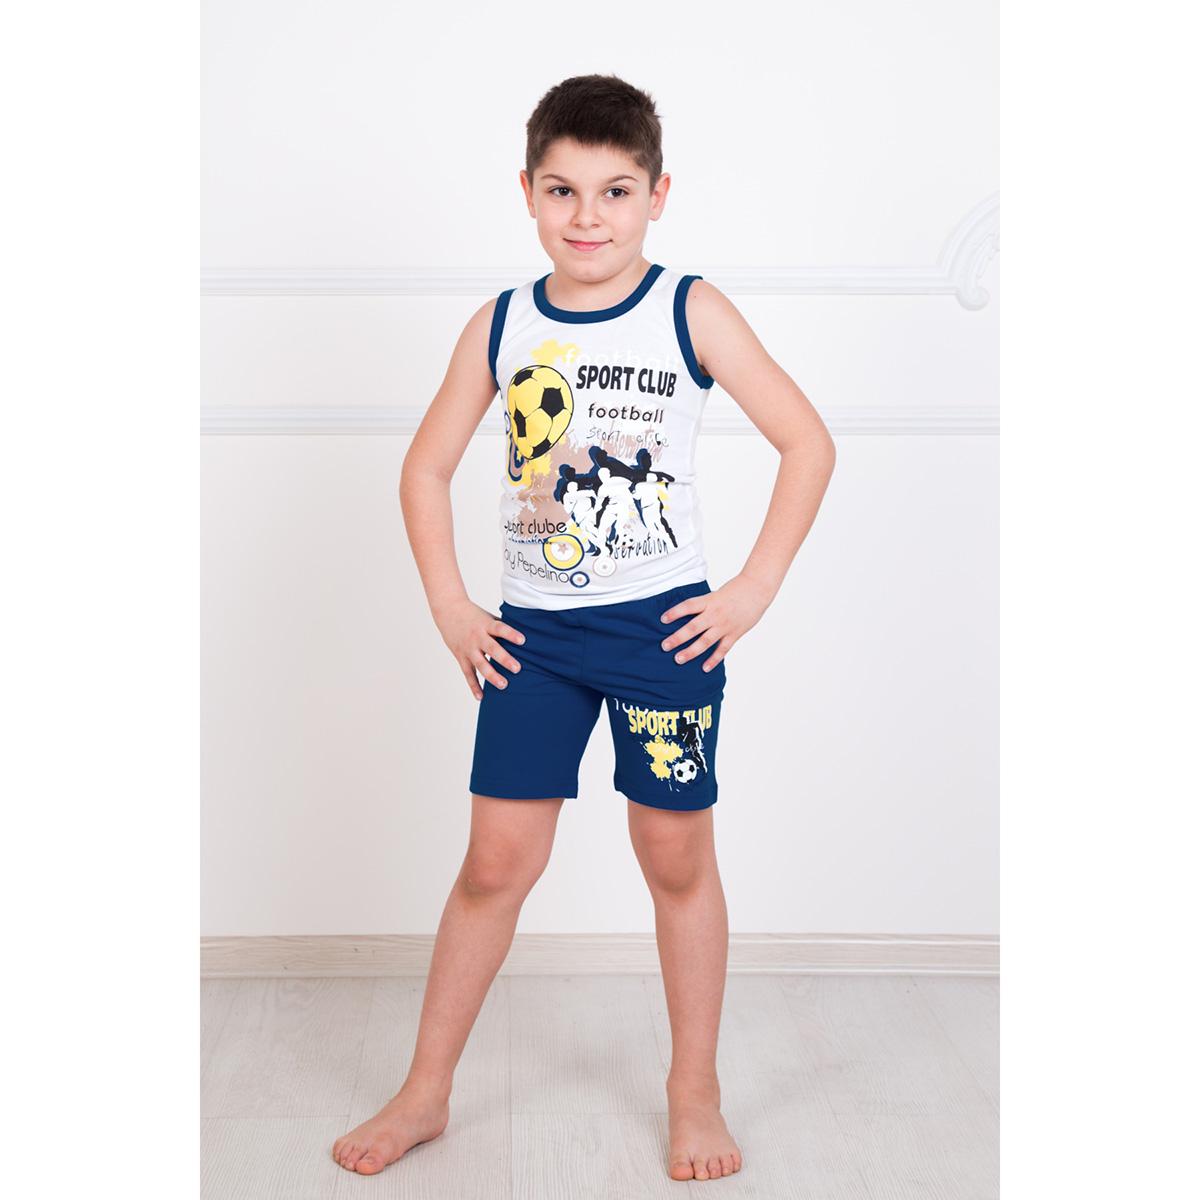 Детский костюм Май Синий, размер 4 годаКостюмы<br><br><br>Тип: Дет. костюм<br>Размер: 4 года<br>Материал: Кулирка